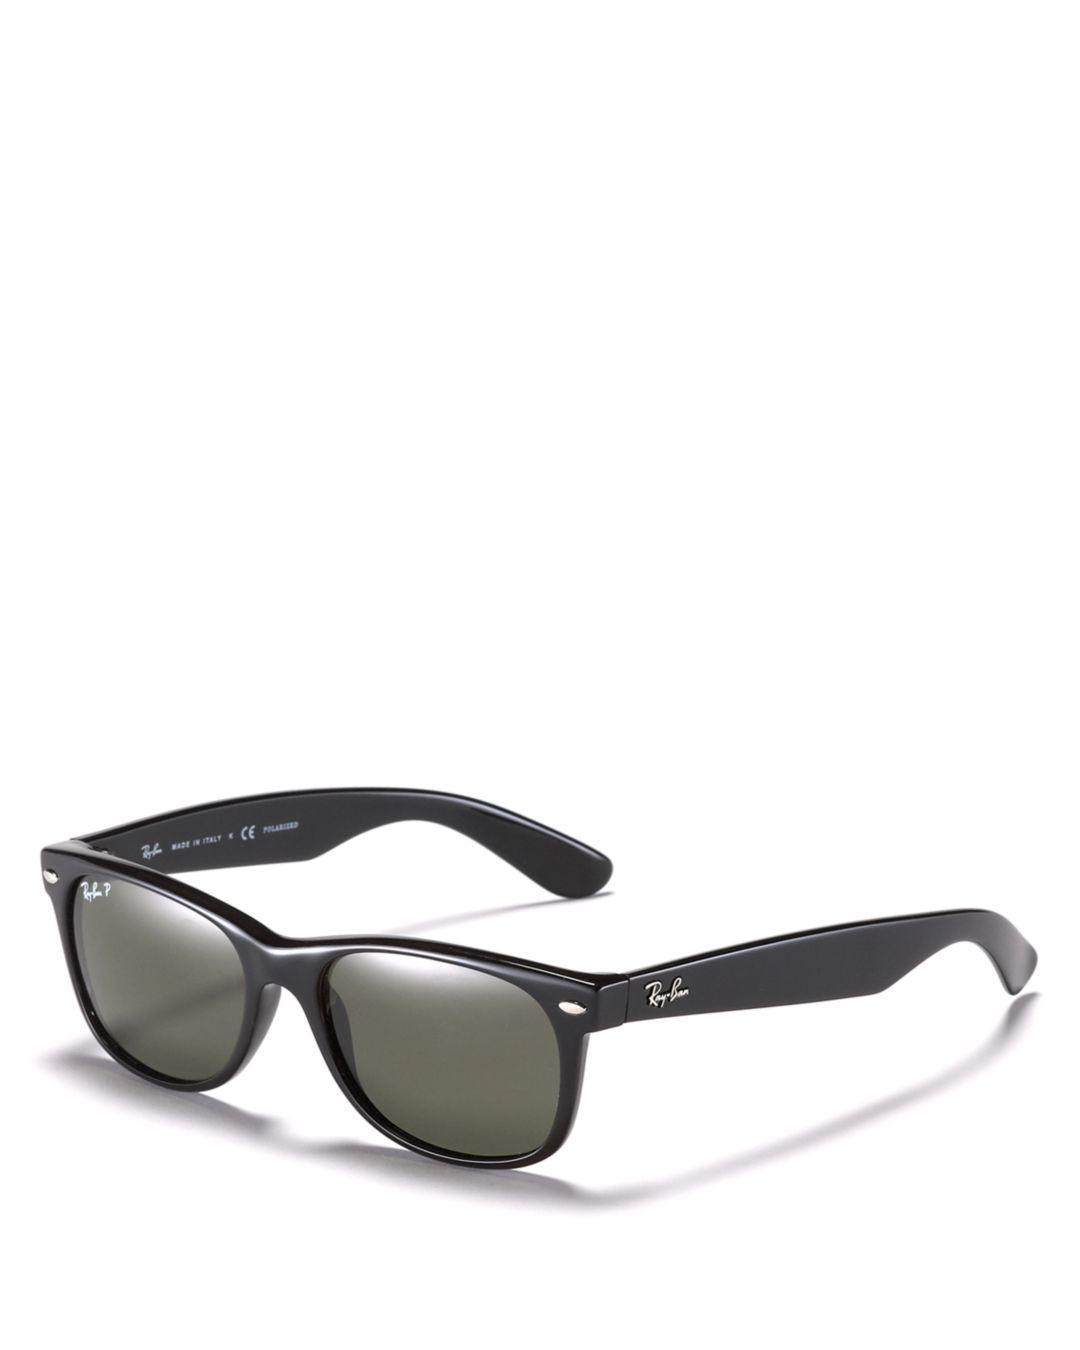 4c6632f470 Ray-Ban New Wayfarer Polarized Sunglasses in Black - Lyst